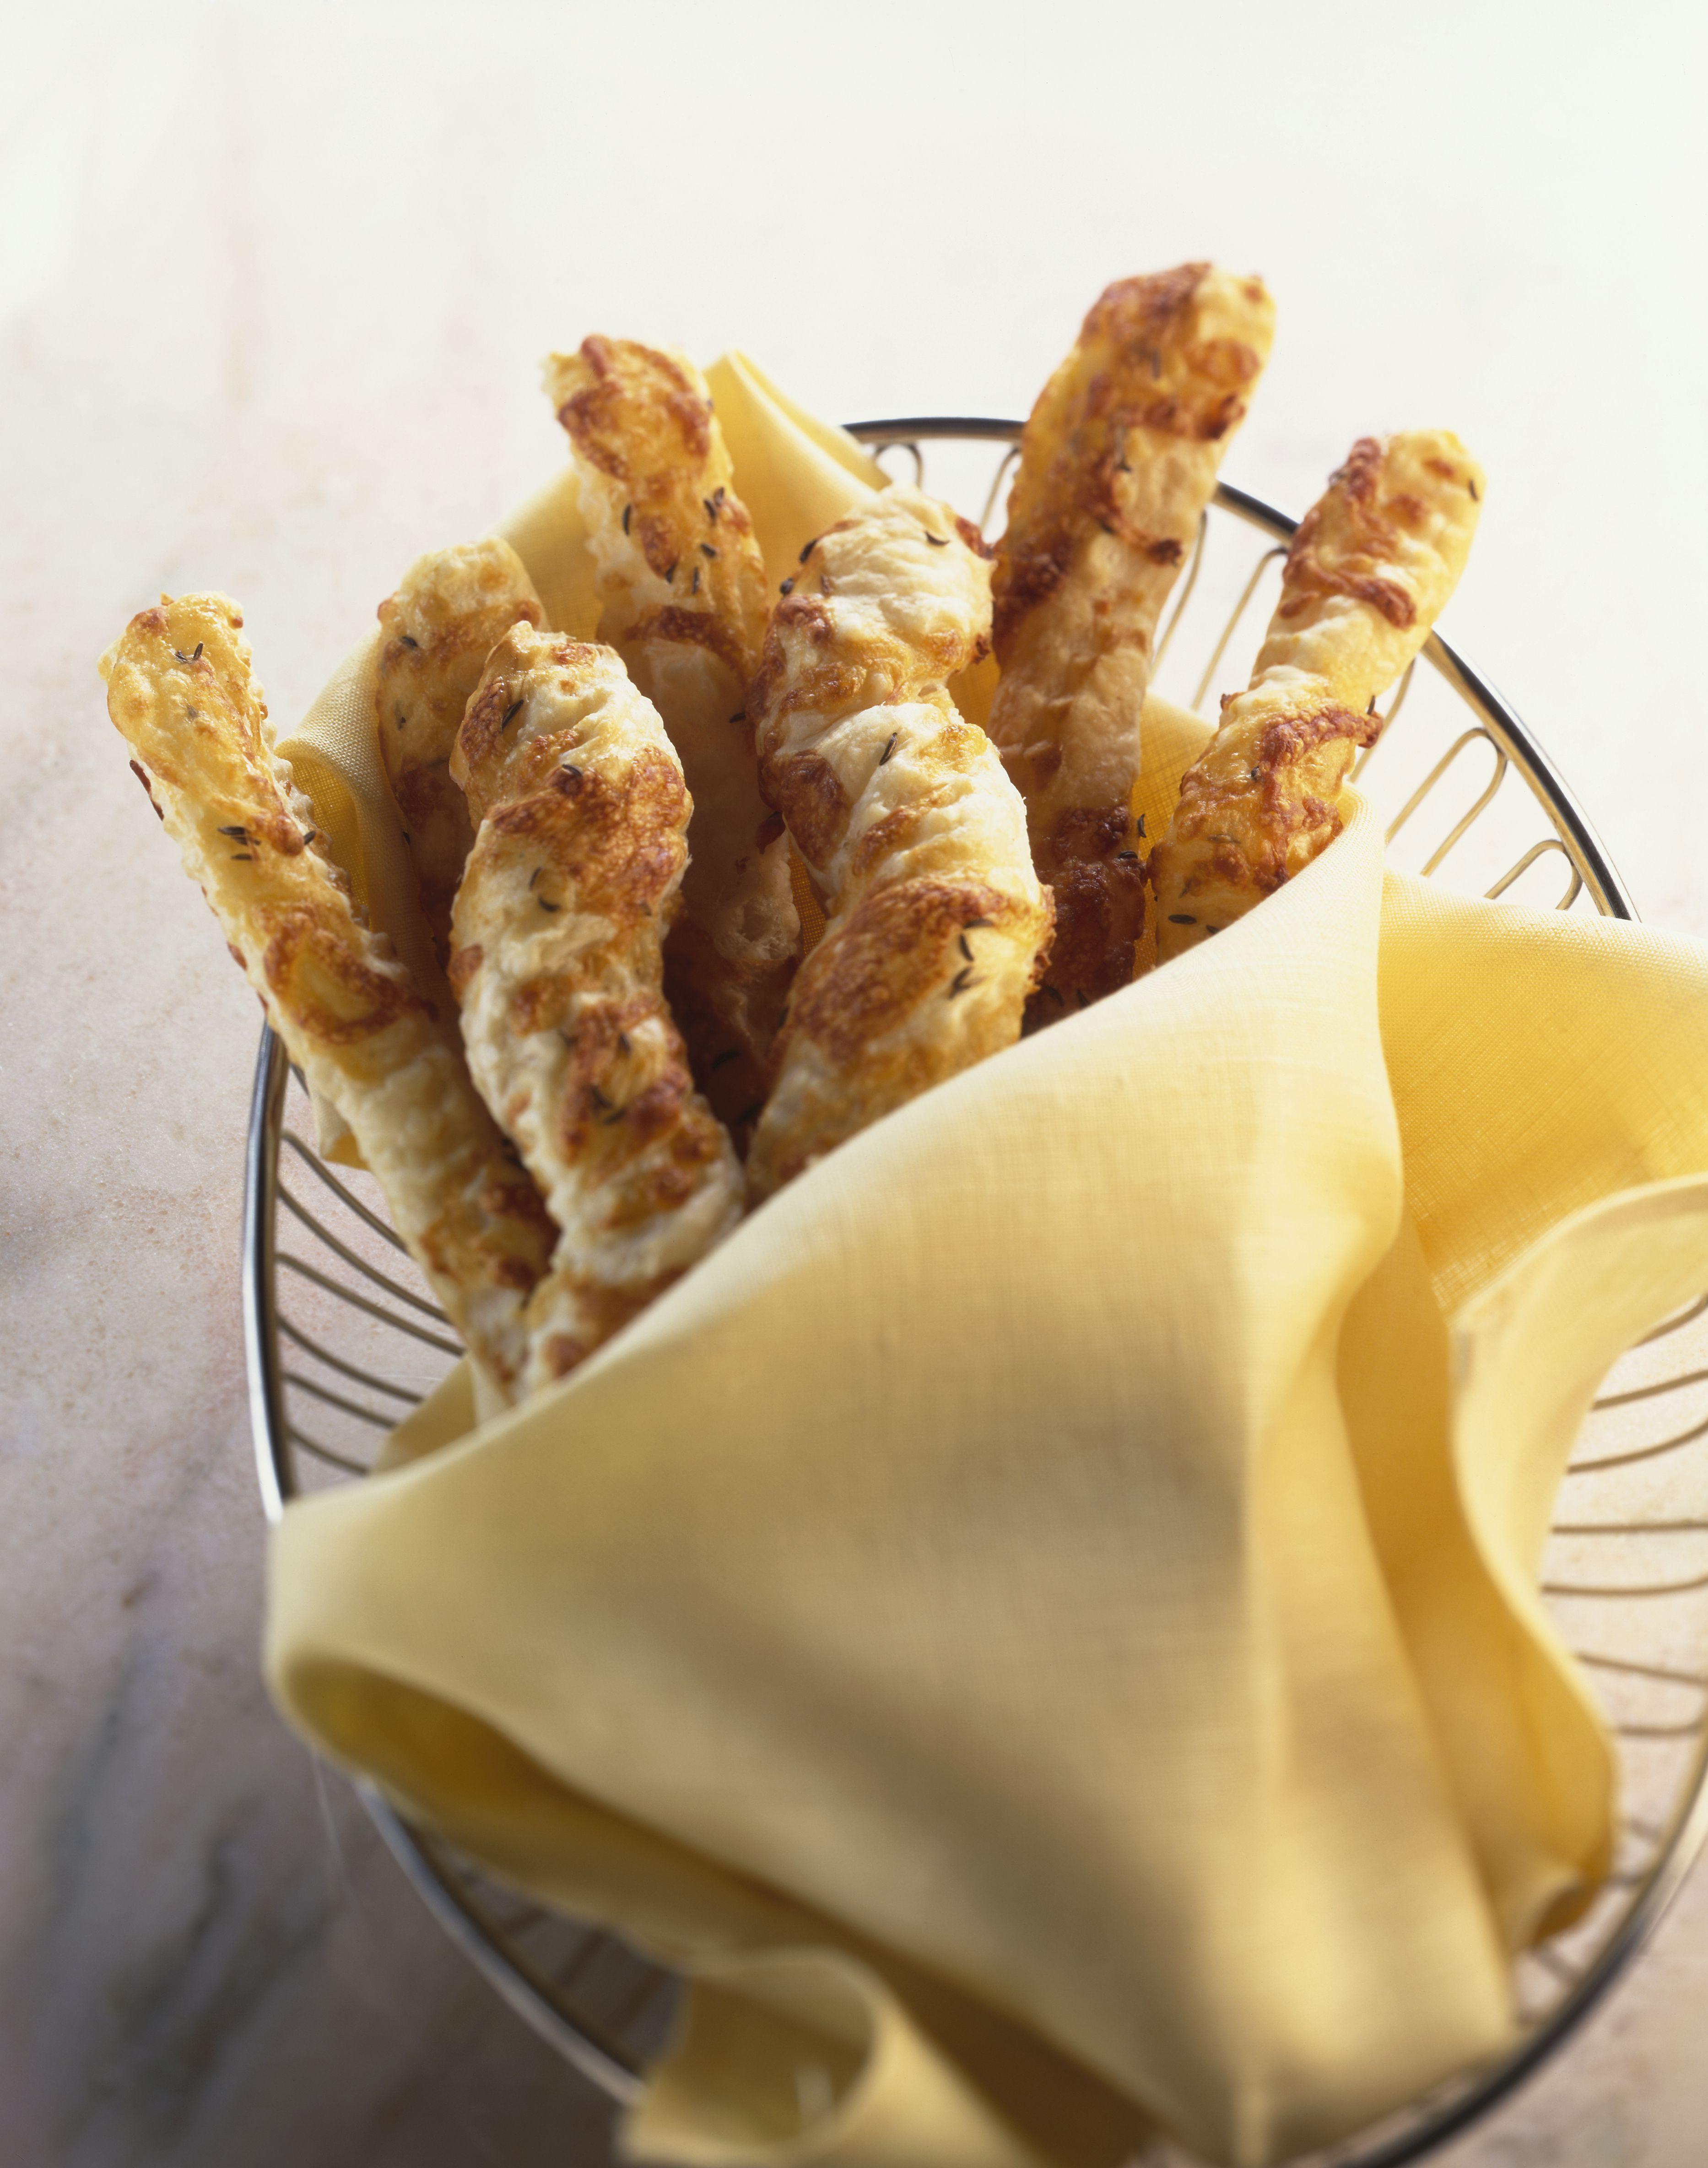 Caraway cheese straws